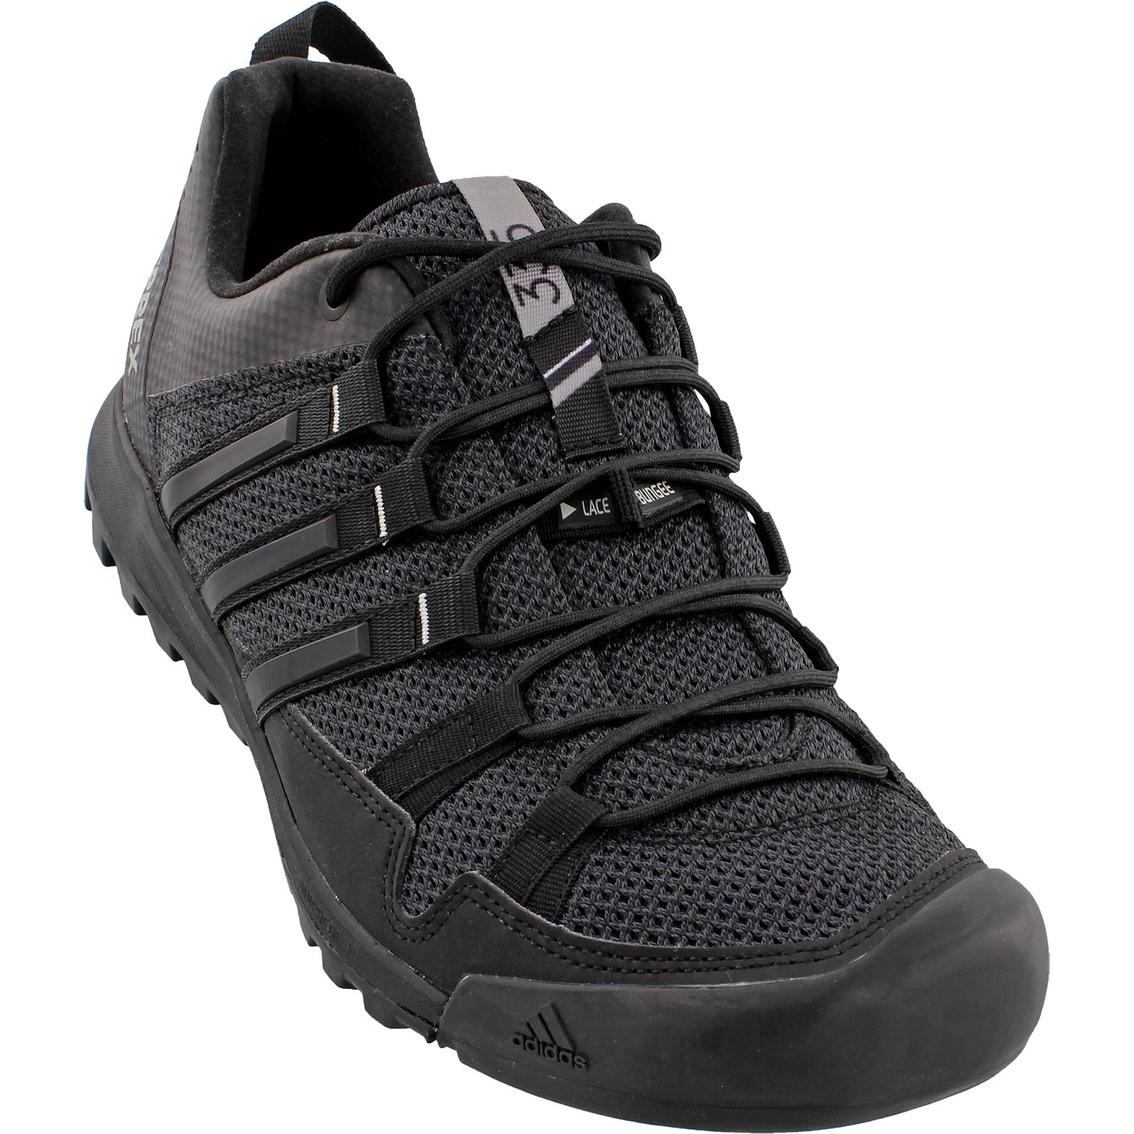 b1c7a9c30c2 adidas outdoor terrex solo approach shoe